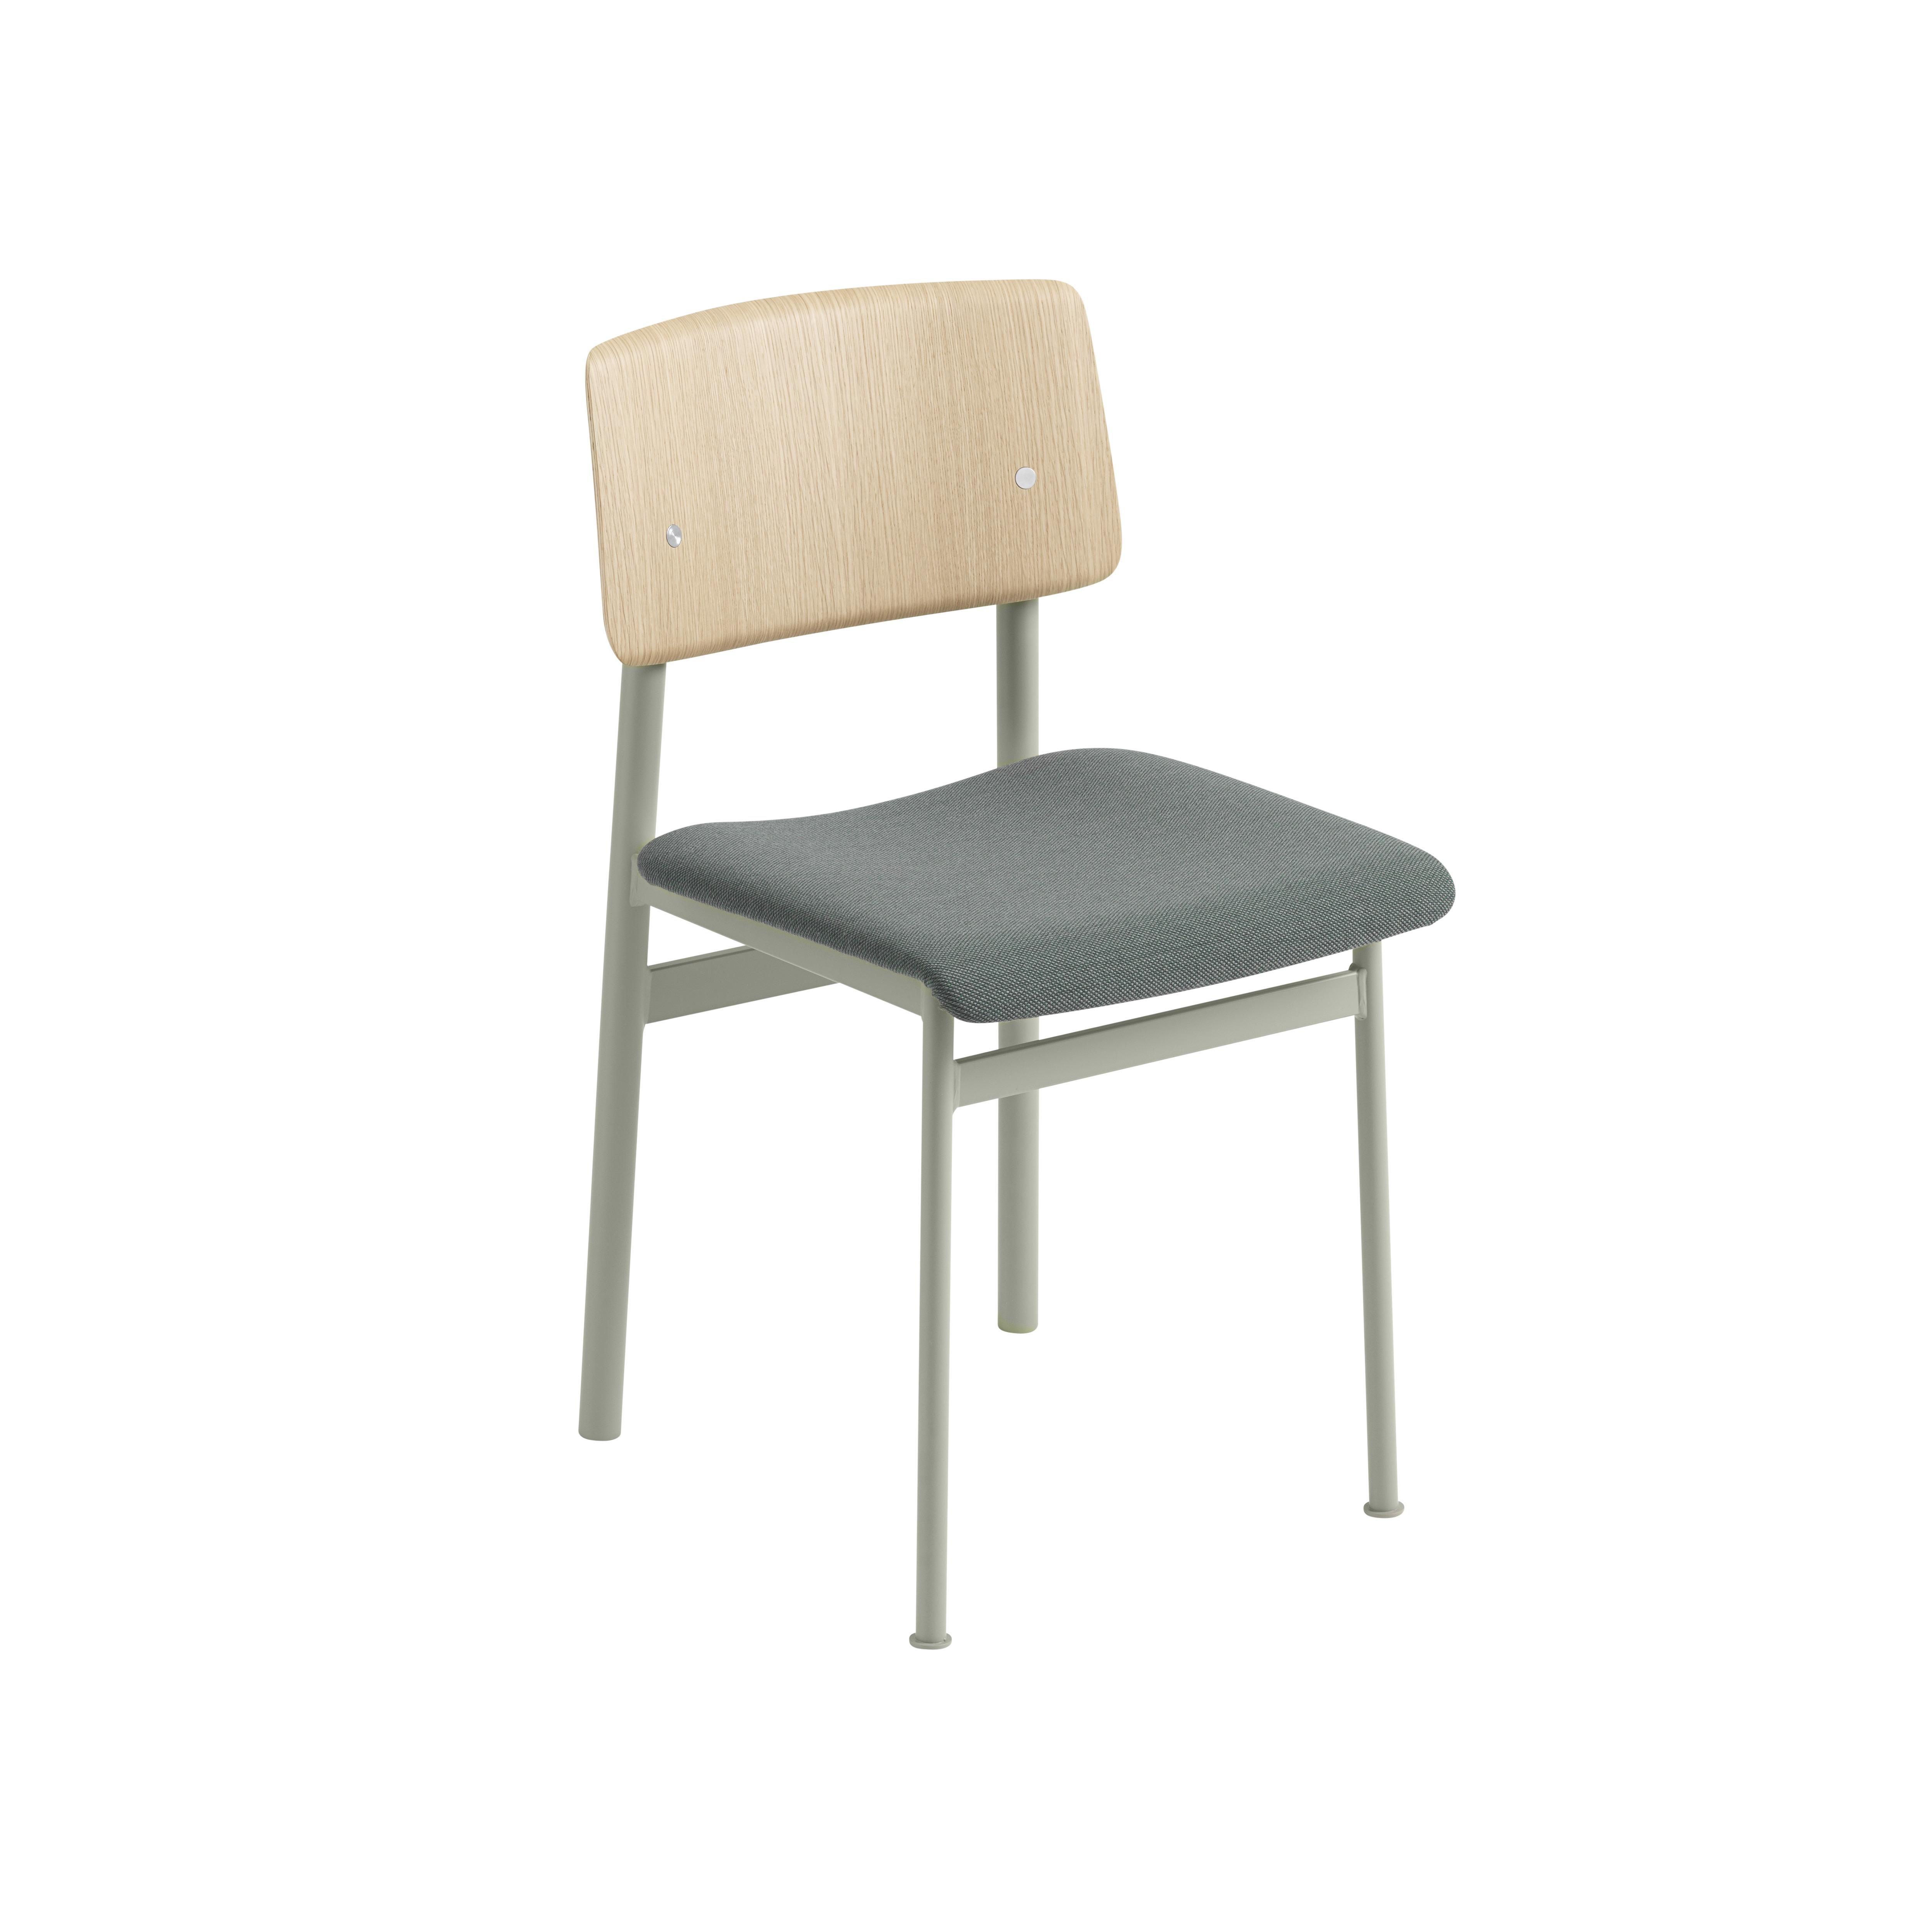 Thomas – Loft Bentzen Design Muuto Chaise Oxpzkwtiu KlF1Jc